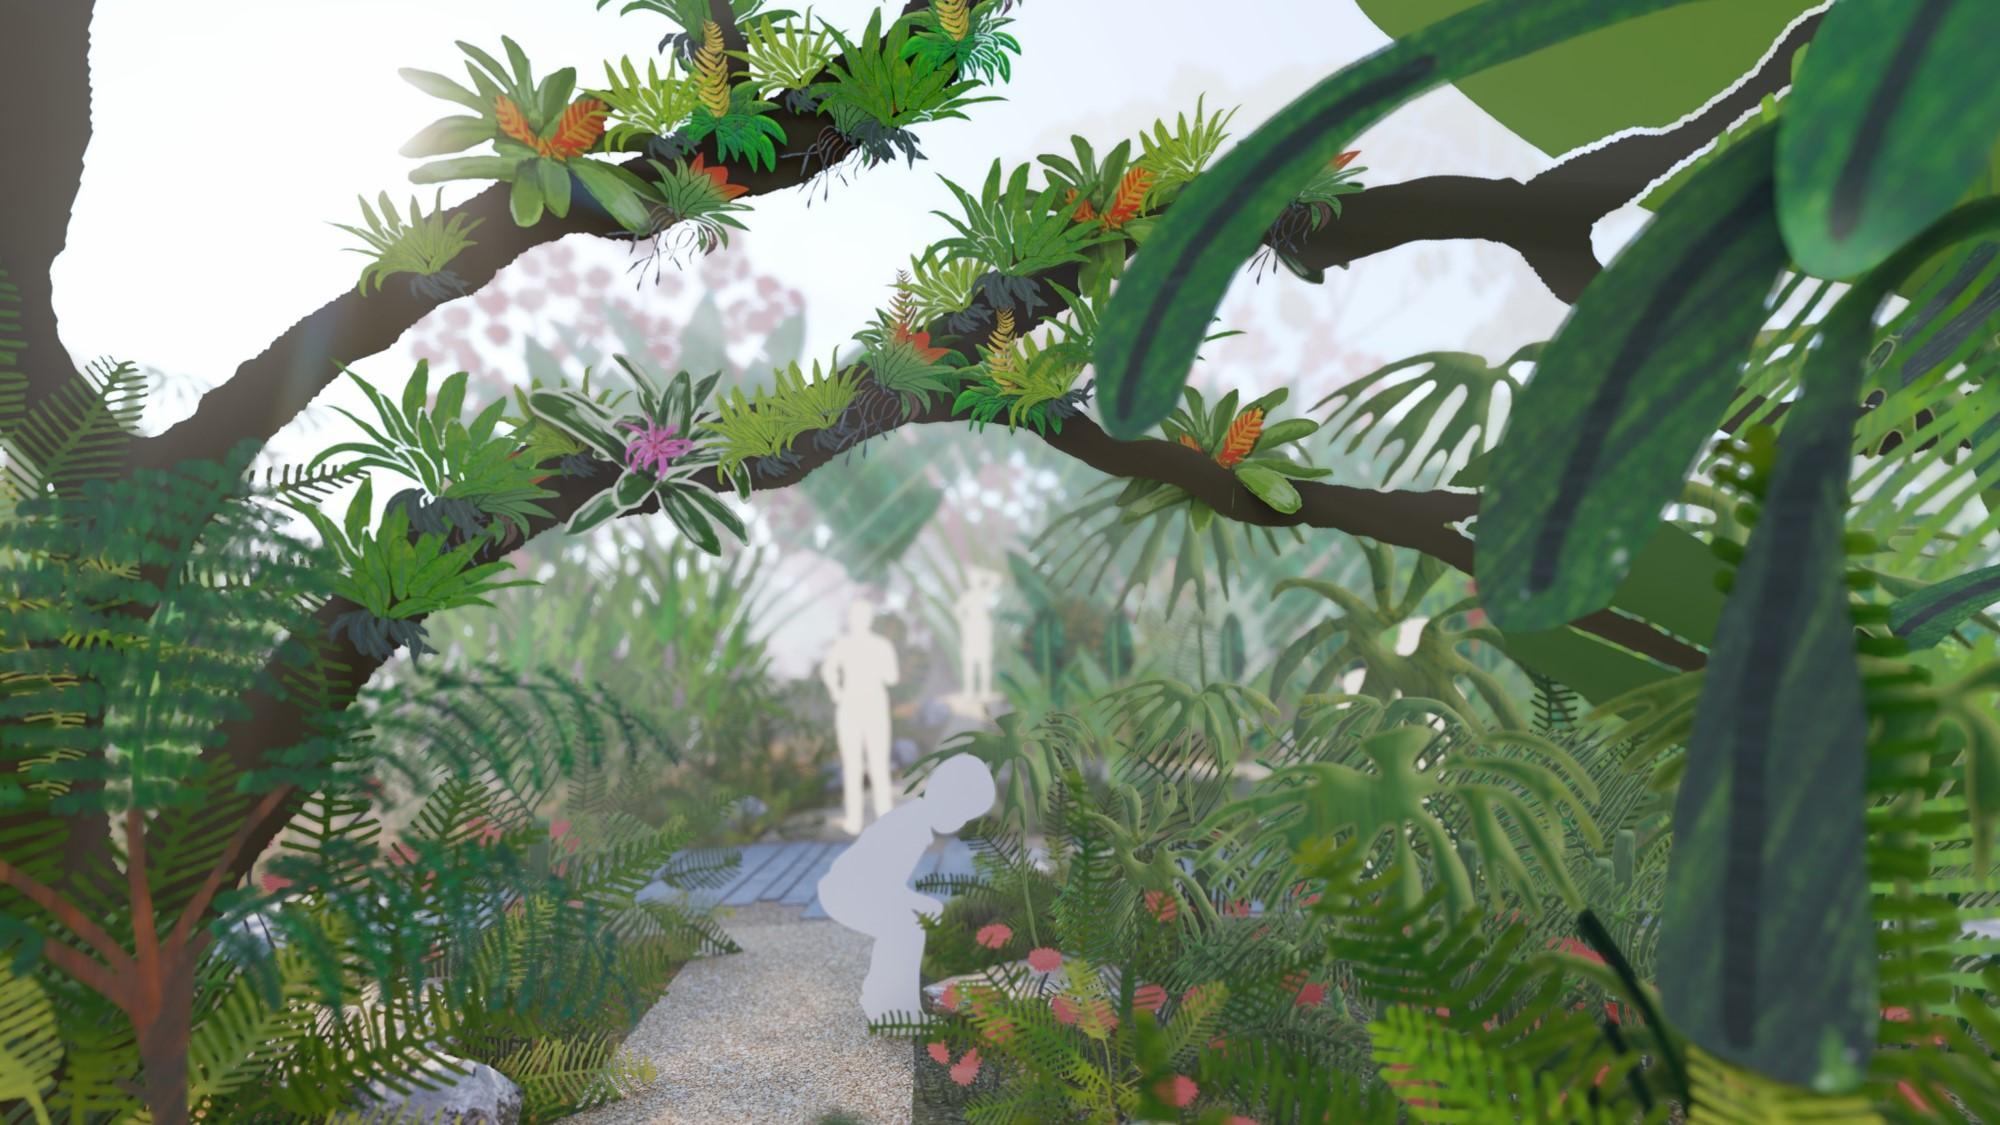 Botanic Garden, coming in 2020, will celebrate Houston's biodiversity